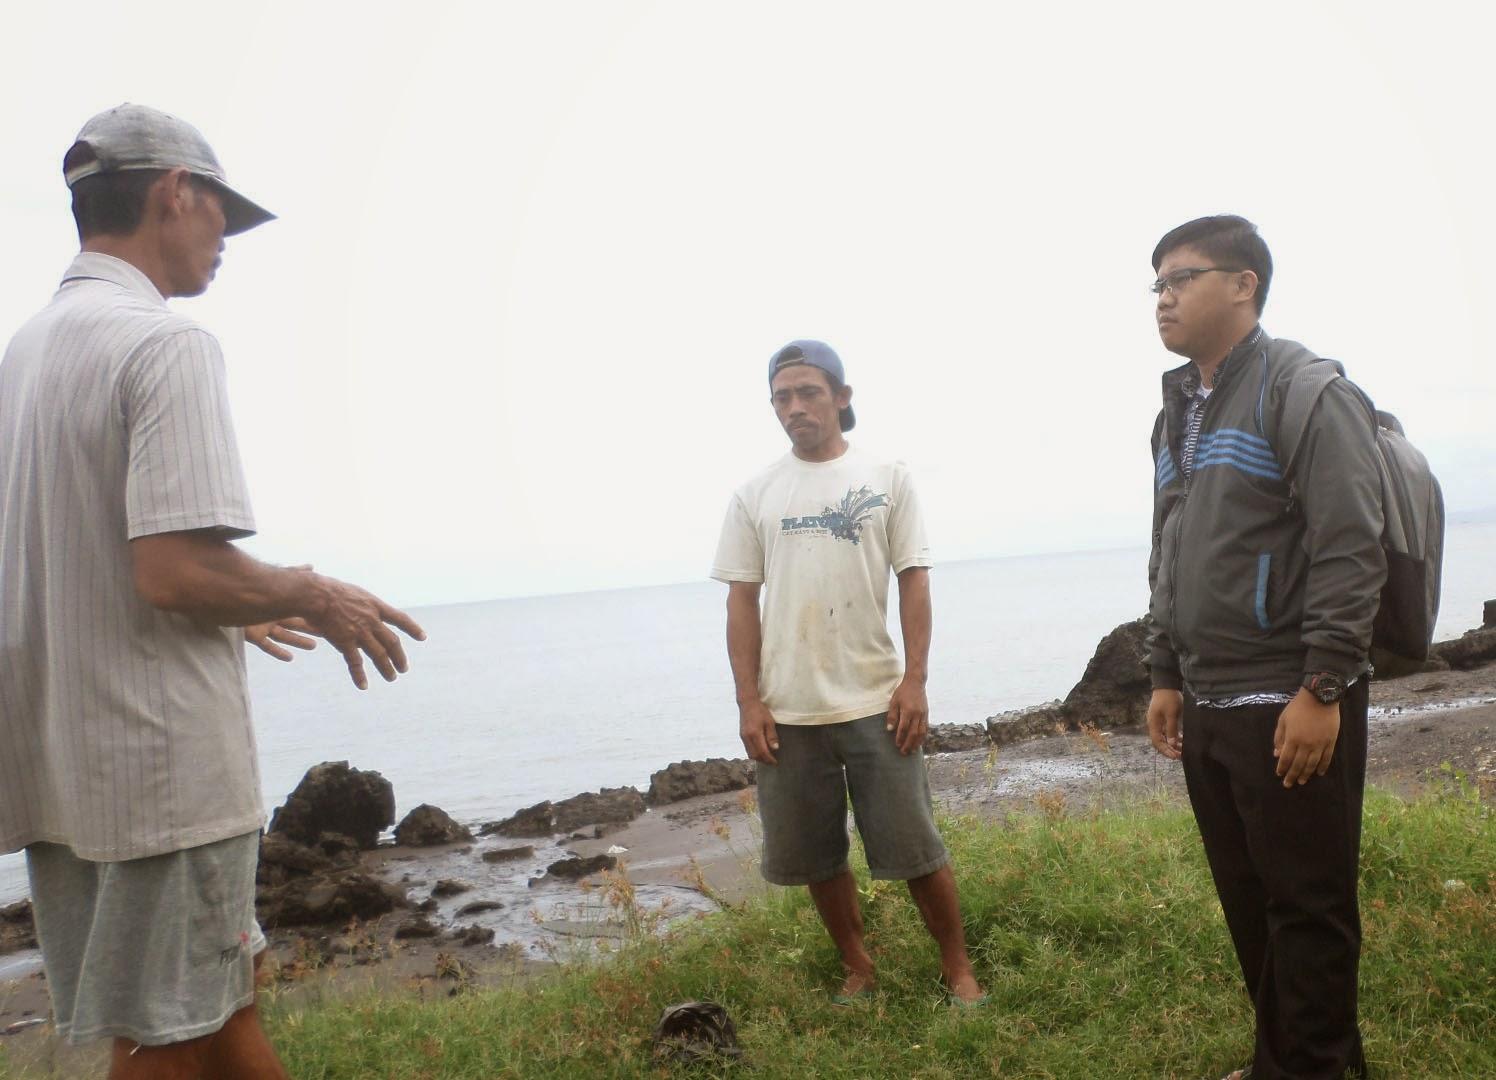 Penyuluh Perikanan Berkoordinasi Rangka Persiapan Perencanaan Bertempat Kawasan Pesisir Pantai